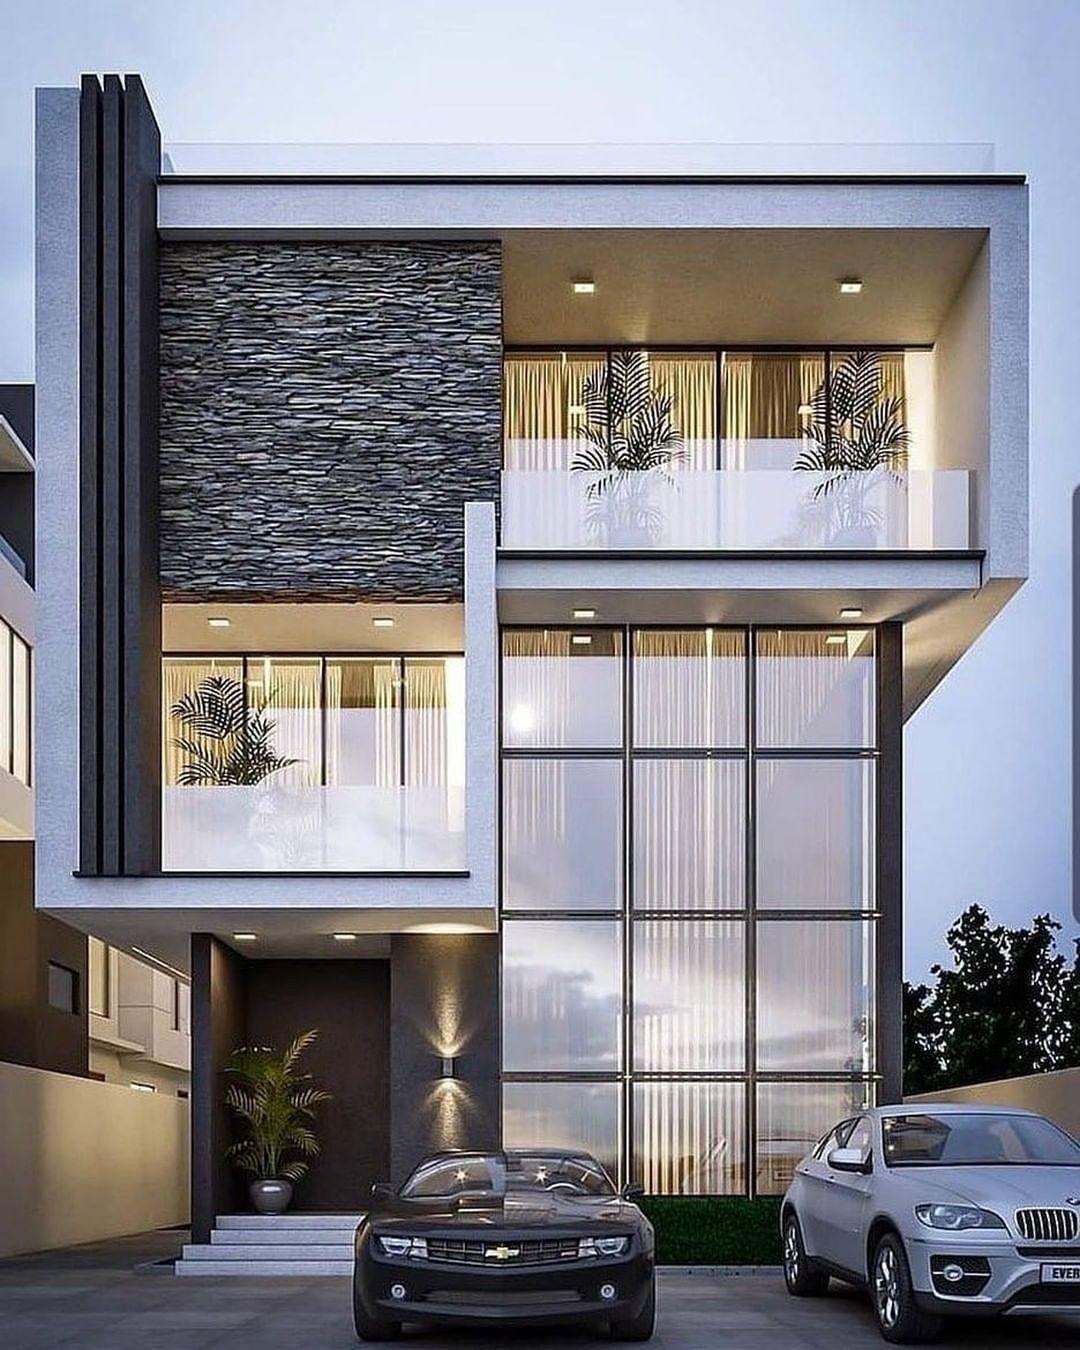 Amazing Exterior Modern House Design Ideas That Will Make Your Abode Cozier Modern Exterior House Designs House Exterior Small House Elevation